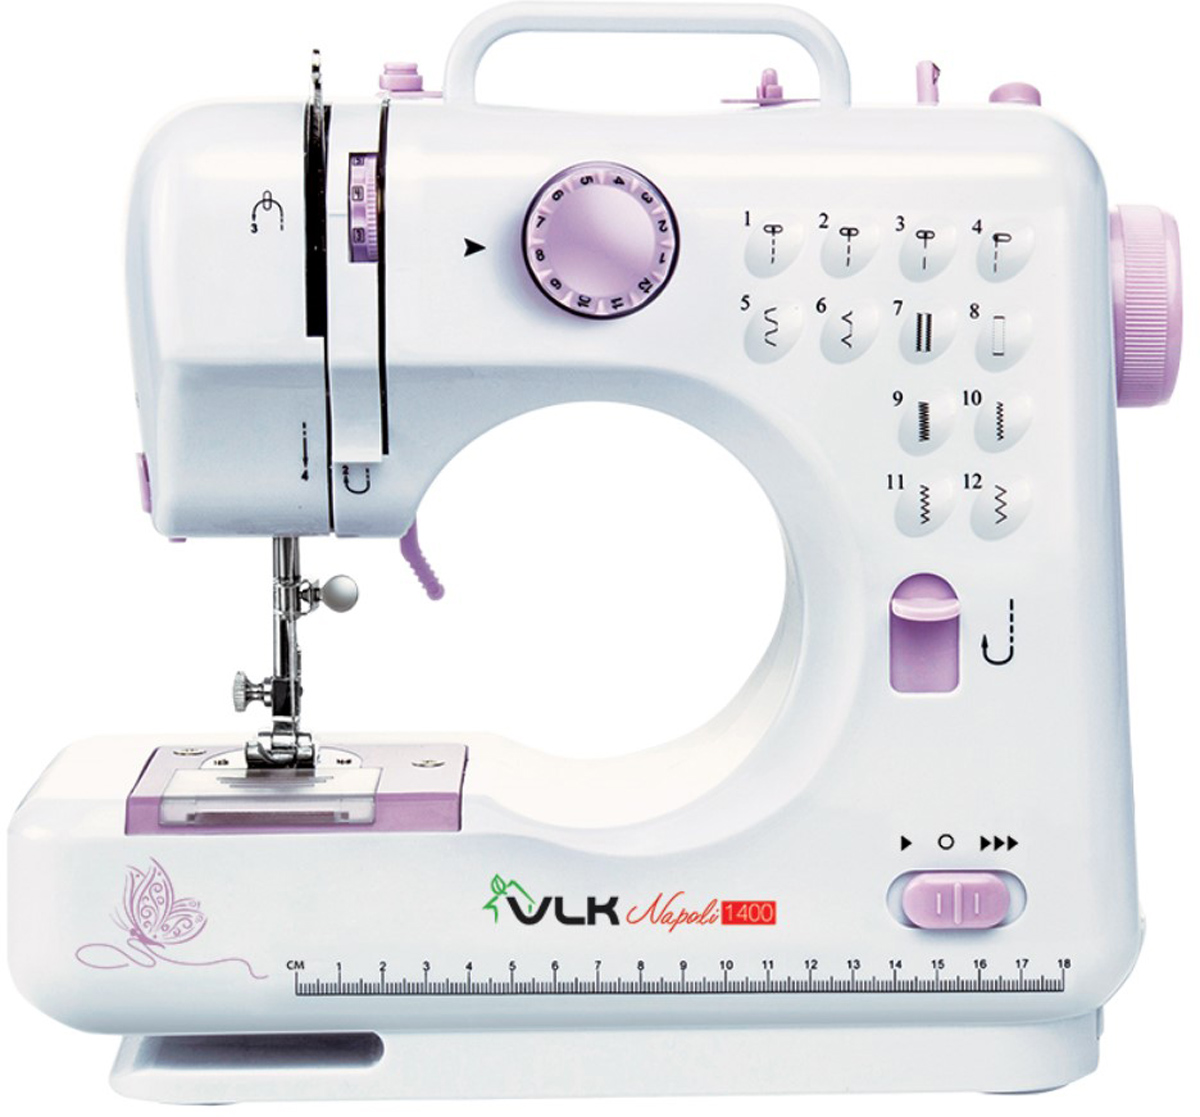 Швейная машина VLK Napoli 1400 швейная машинка kromax vlk napoli 1400